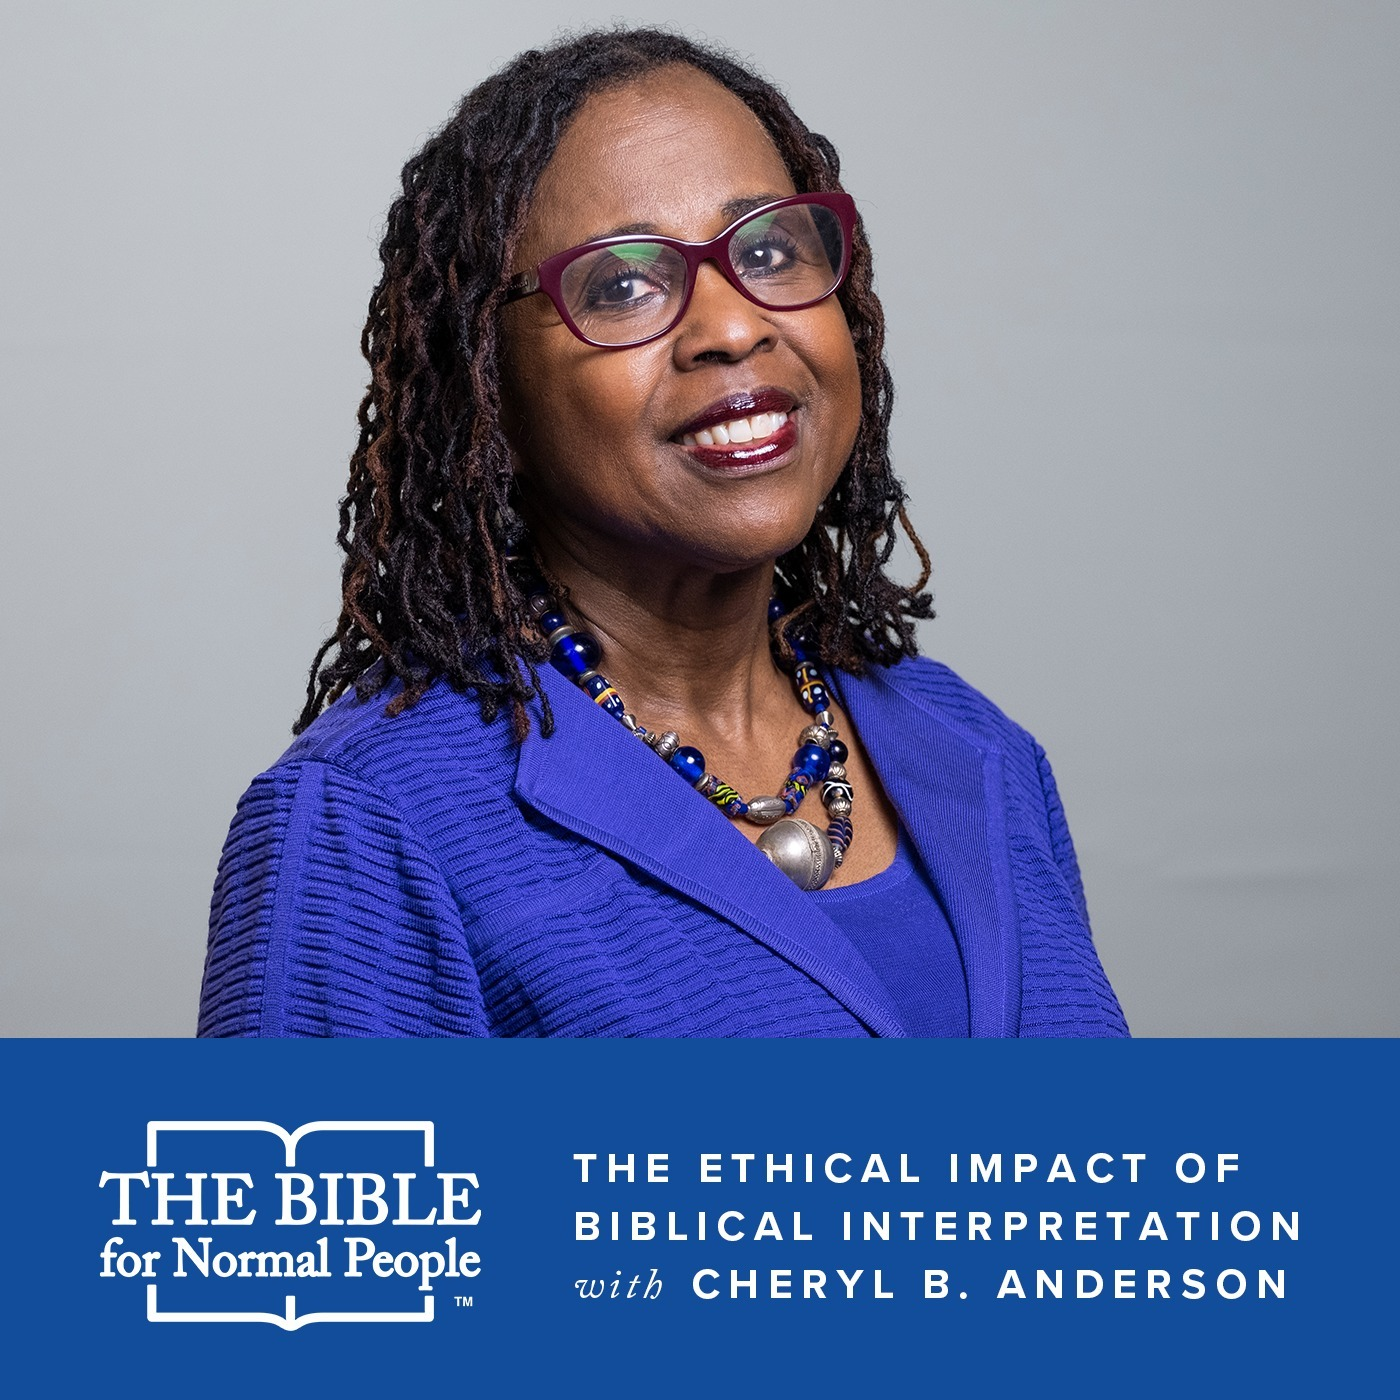 Episode 173: Cheryl B. Anderson - The Ethical Impact of Biblical Interpretation